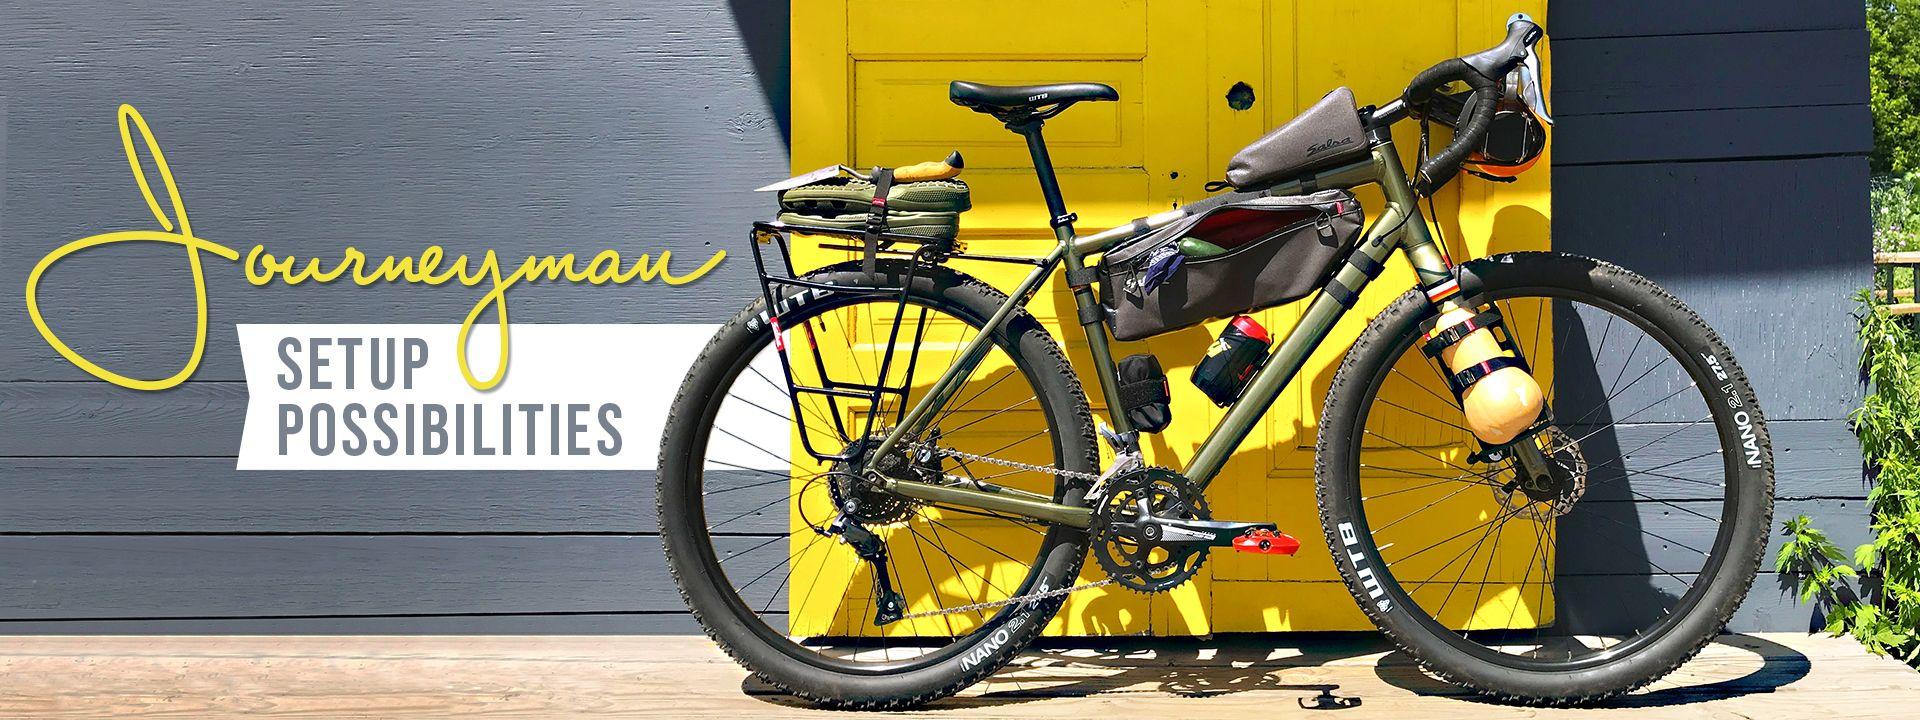 Salsa Journeyman One Bike For Many Riders Salsa Cycles Bike Rider